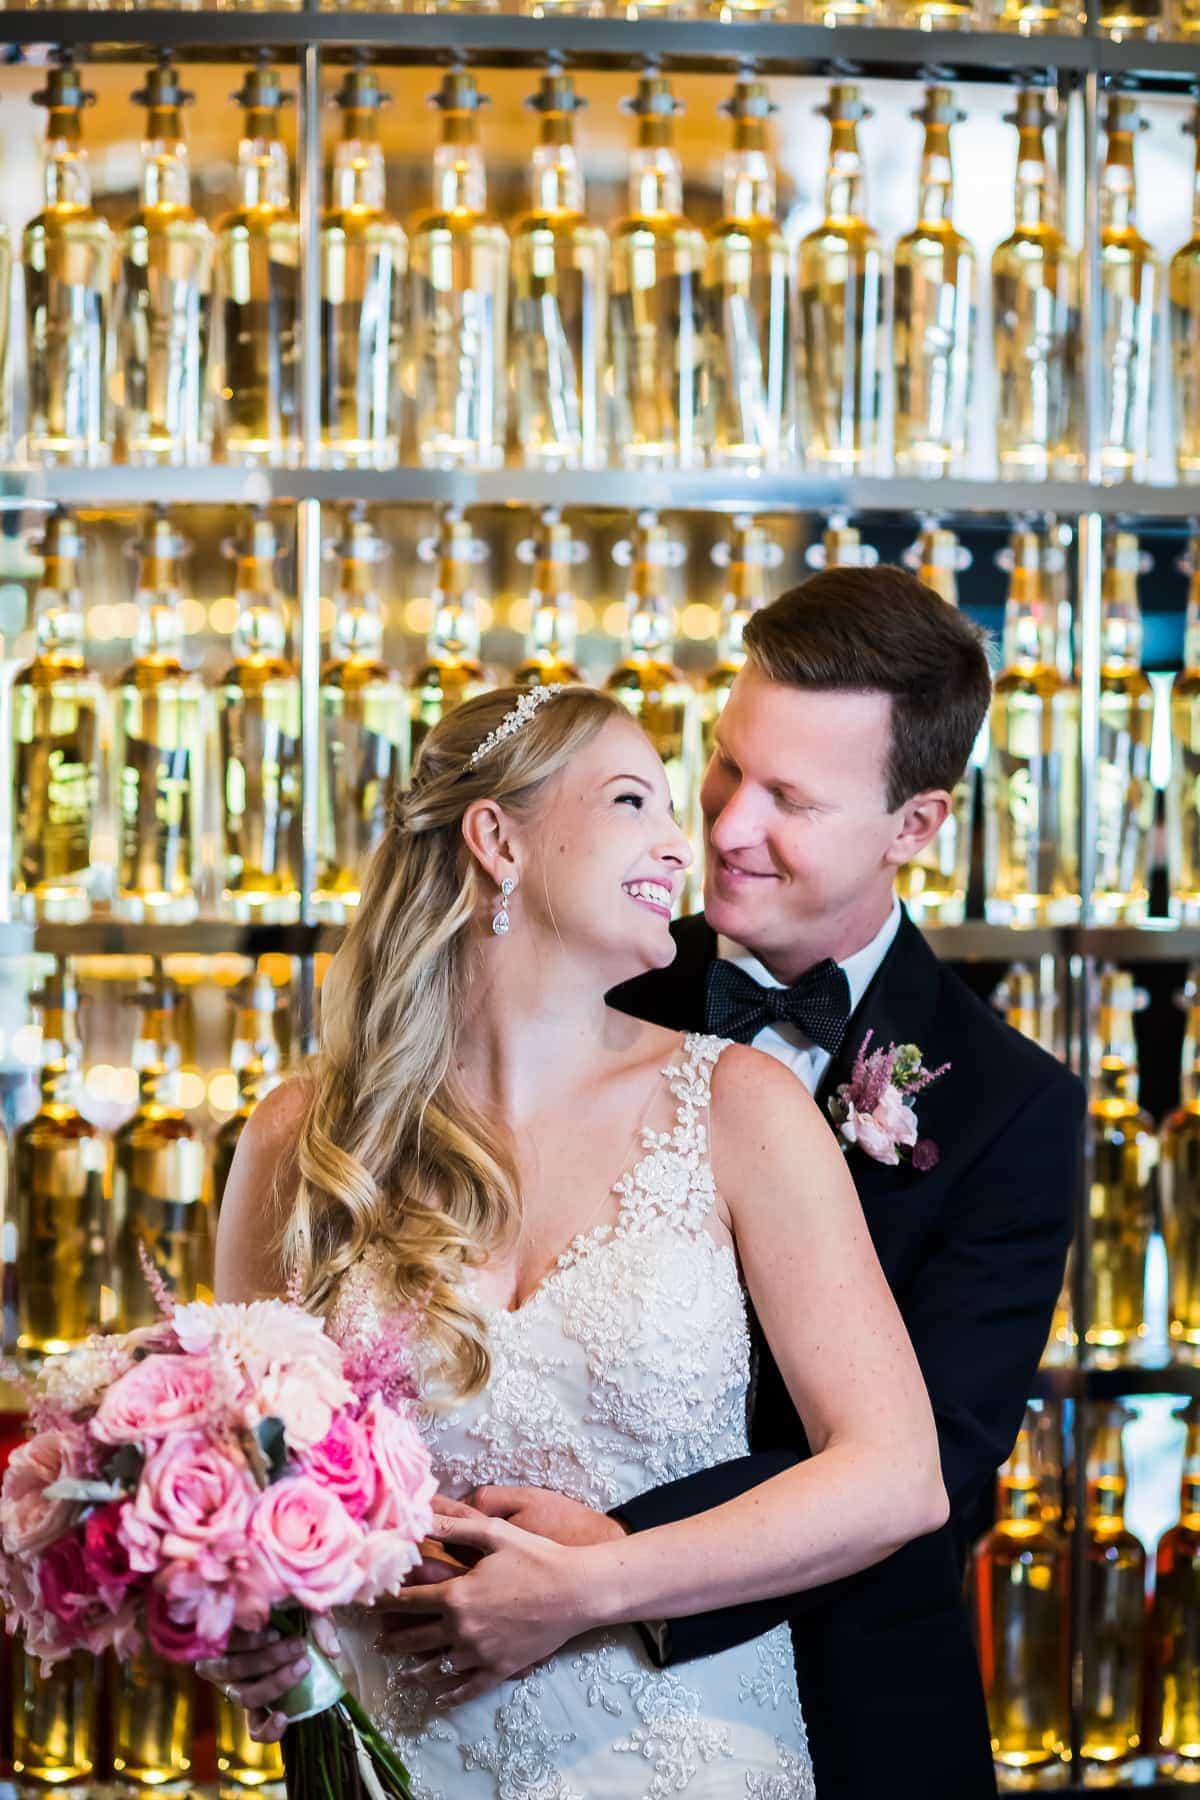 Katie & Scott - A Love Story